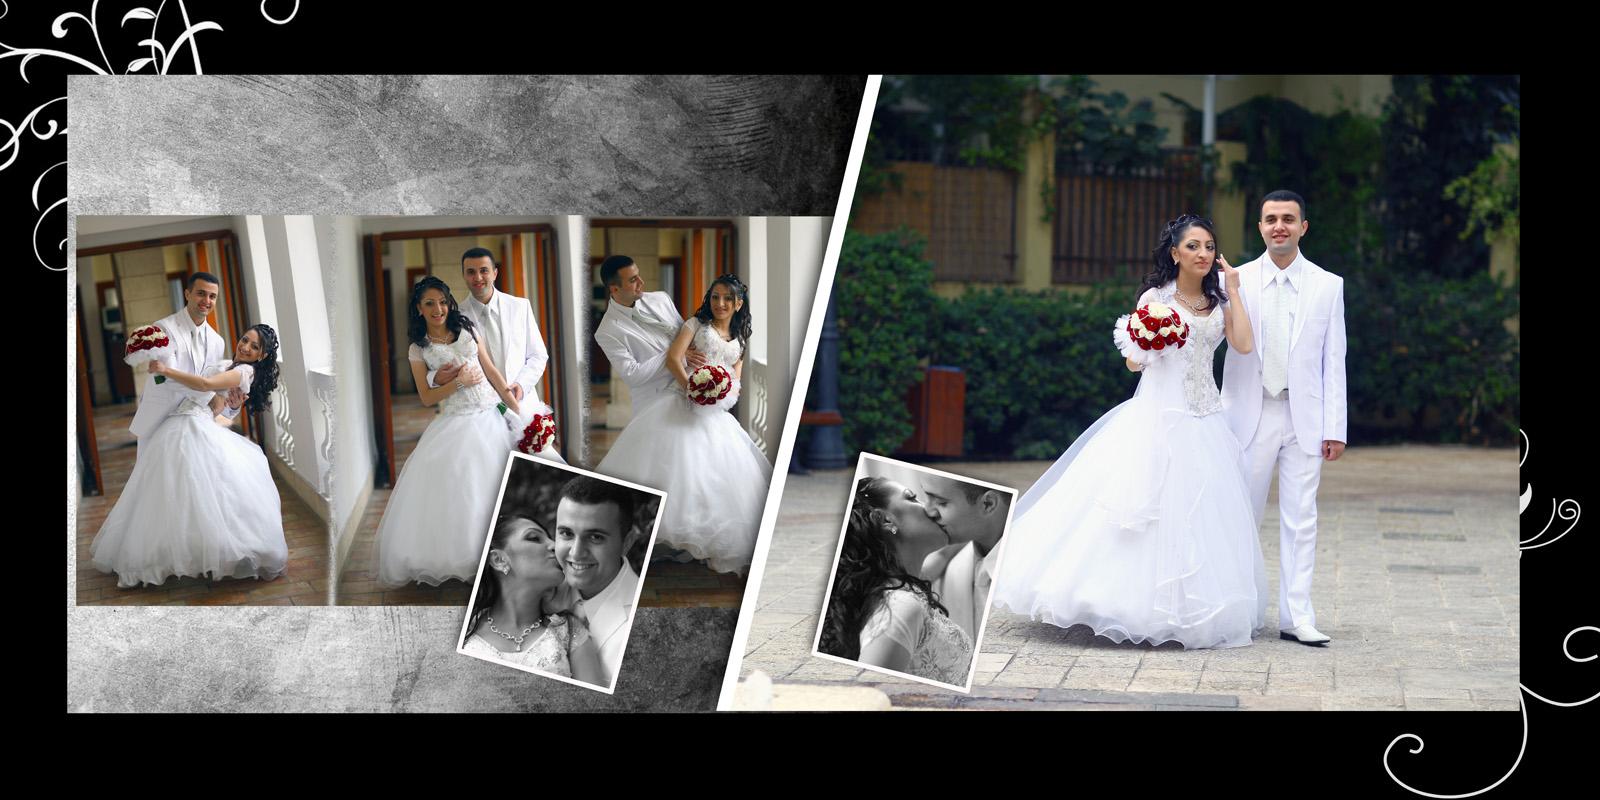 sheri johnson modern wedding photographer atlanta ga photo